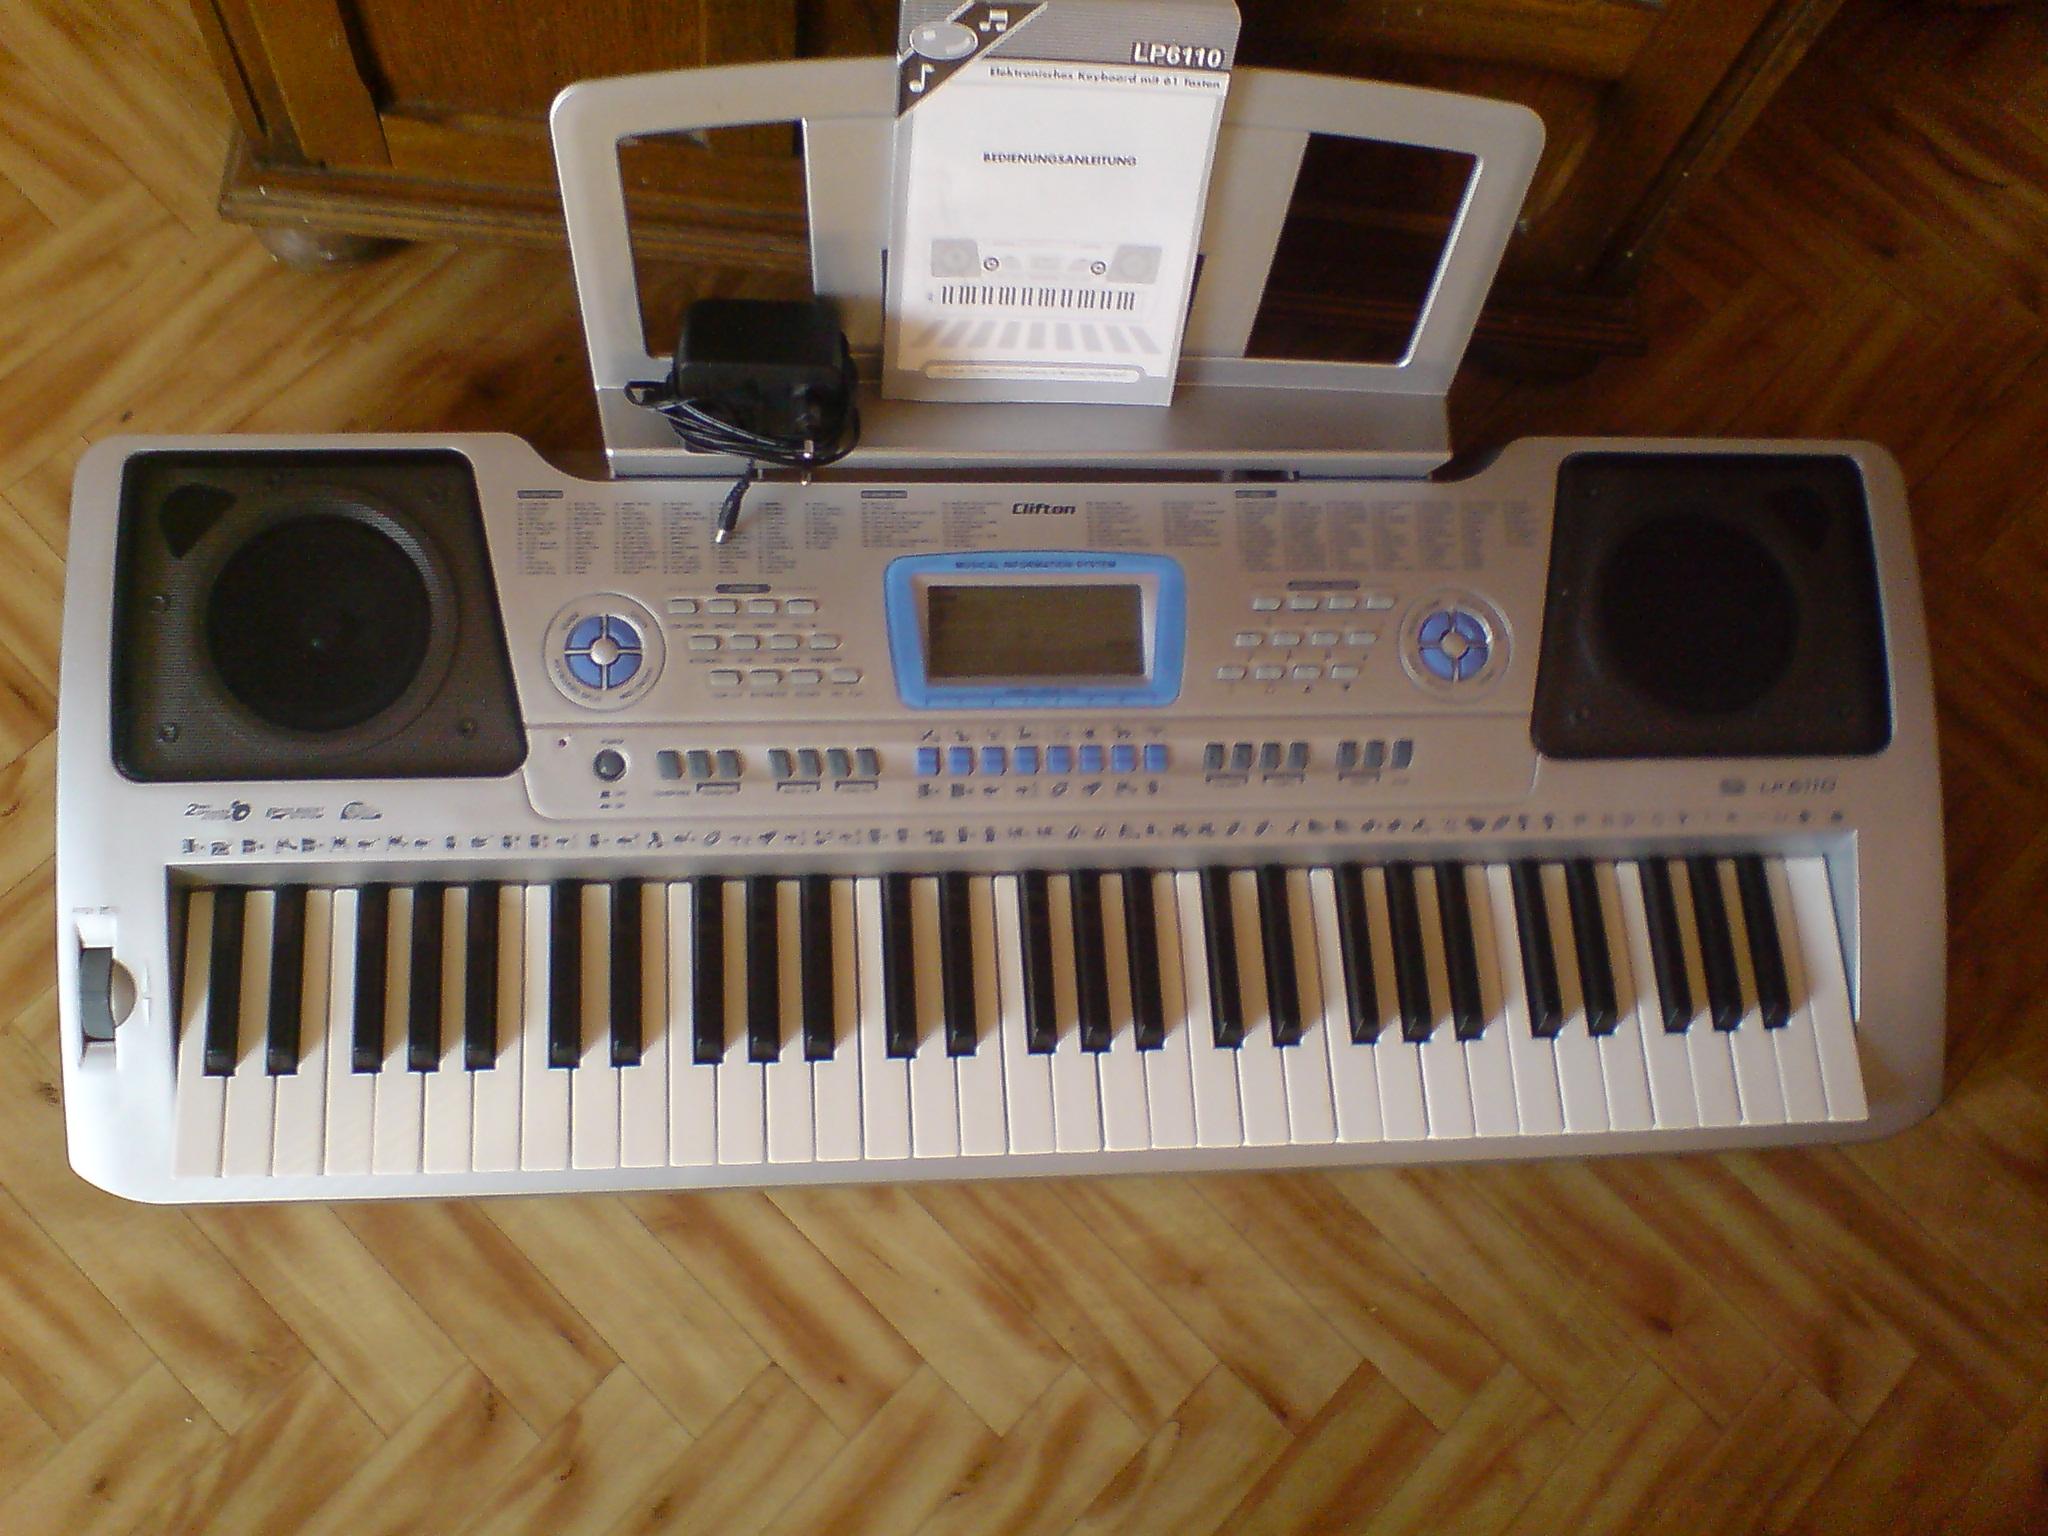 [Sprzedam] Keyboard Clifton LP 6110